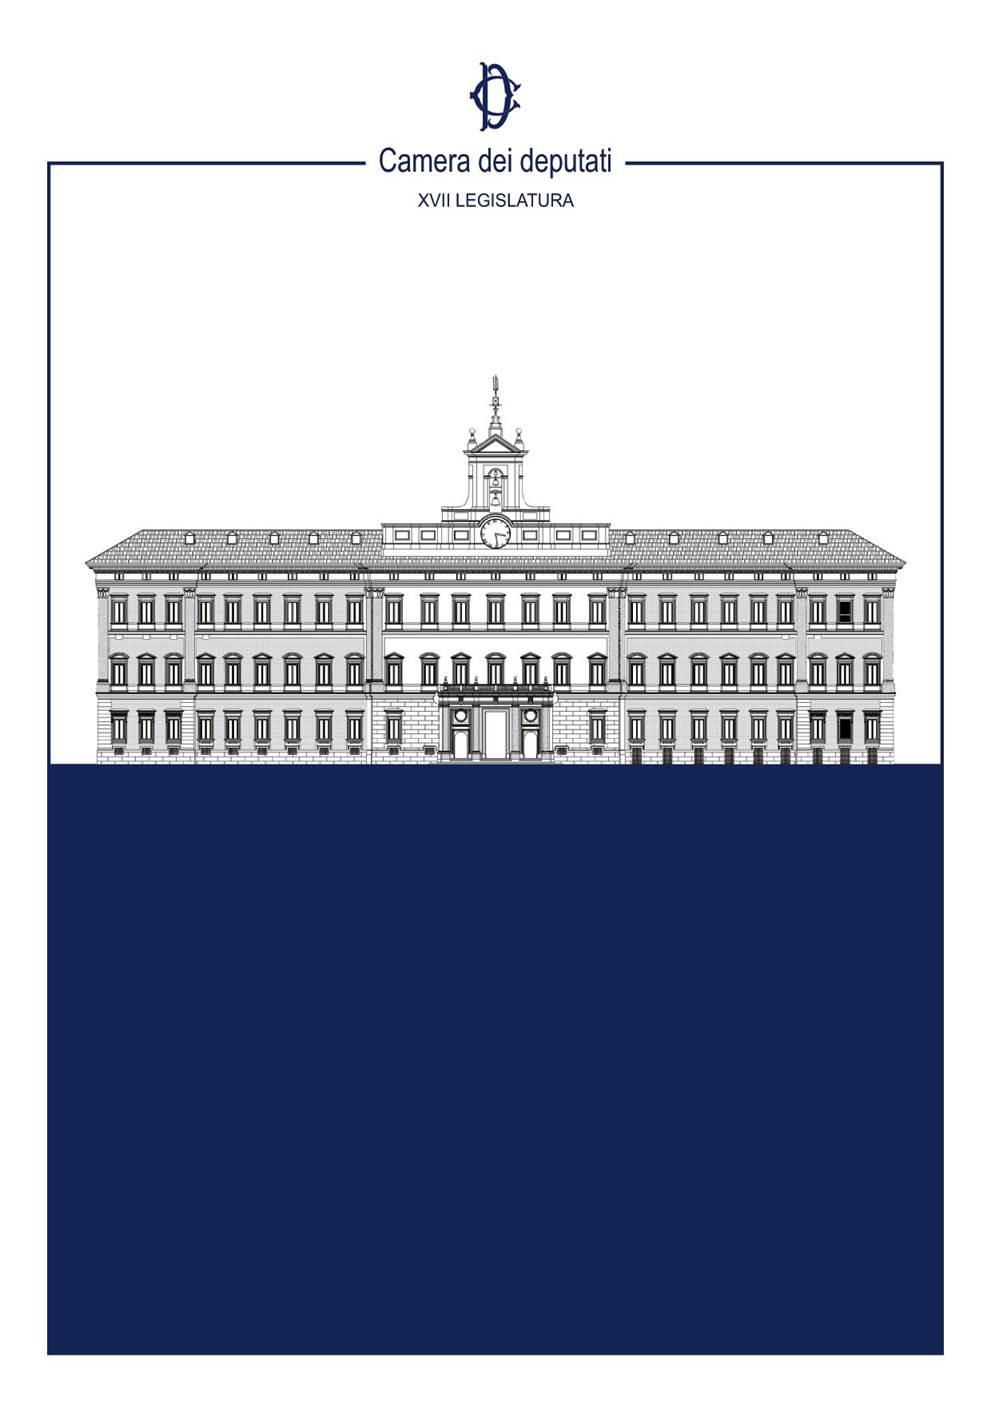 Camera dei deputati dossier es0391 for Deputati camera numero